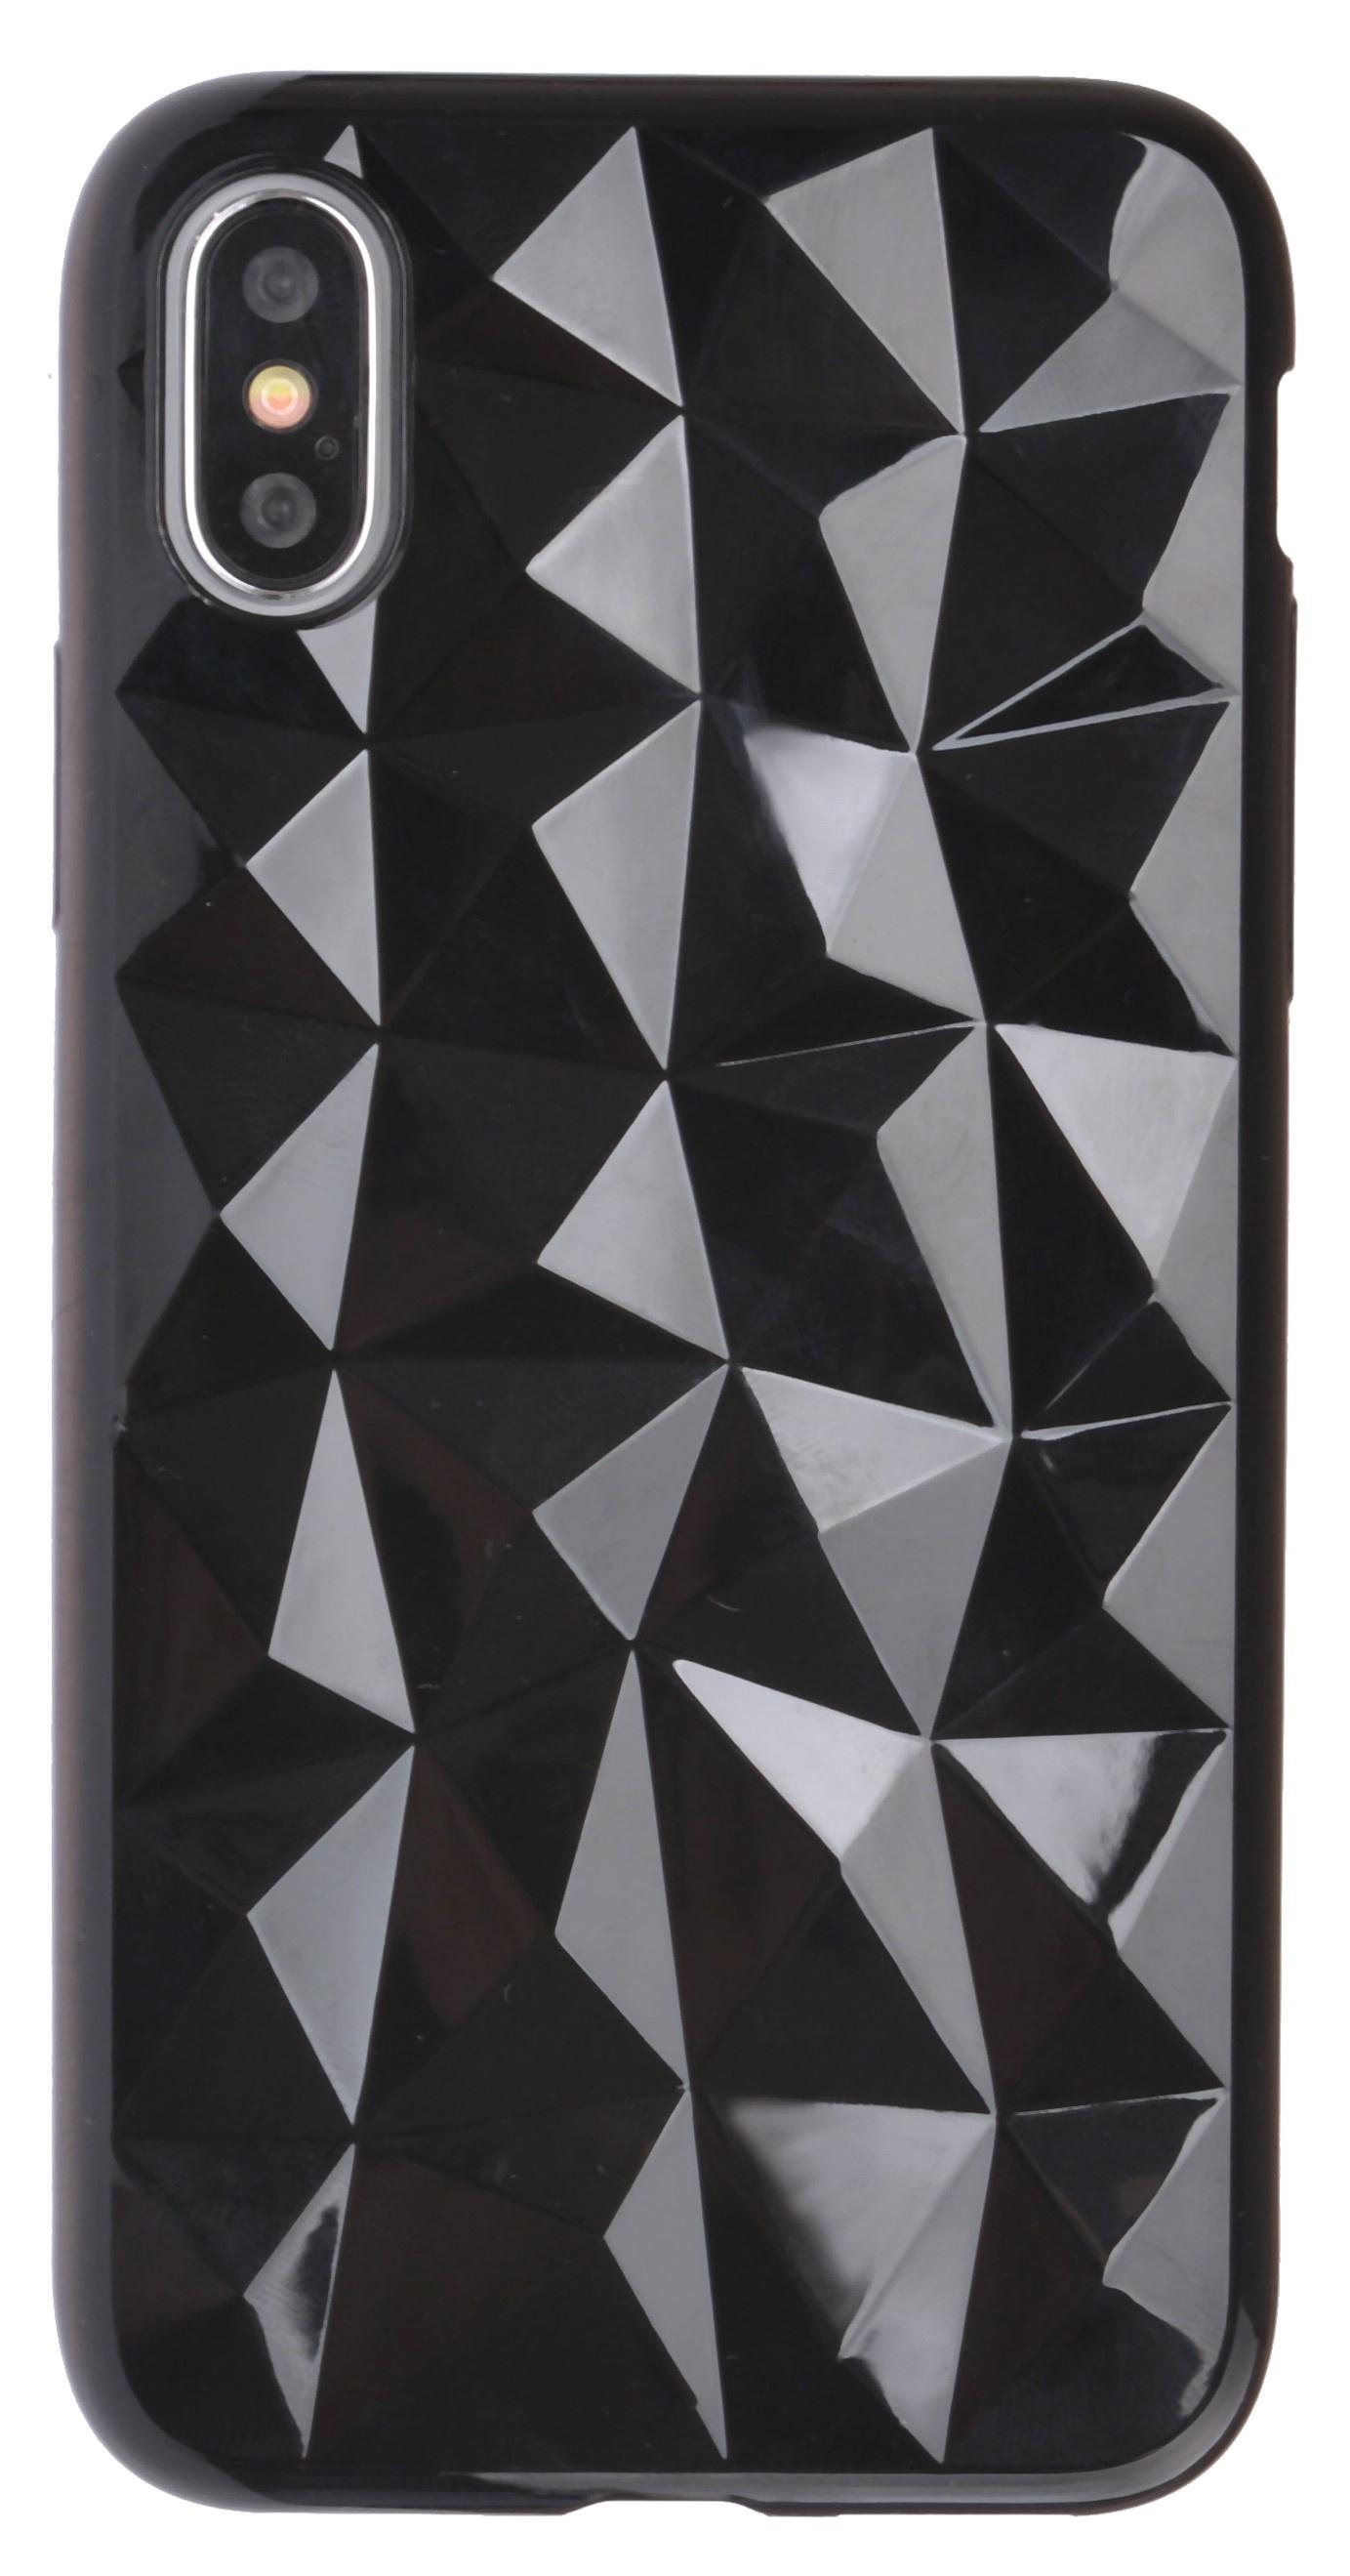 Чехол-накладка Skinbox Diamond для Apple iPhone X, 4630042521001, черный цены